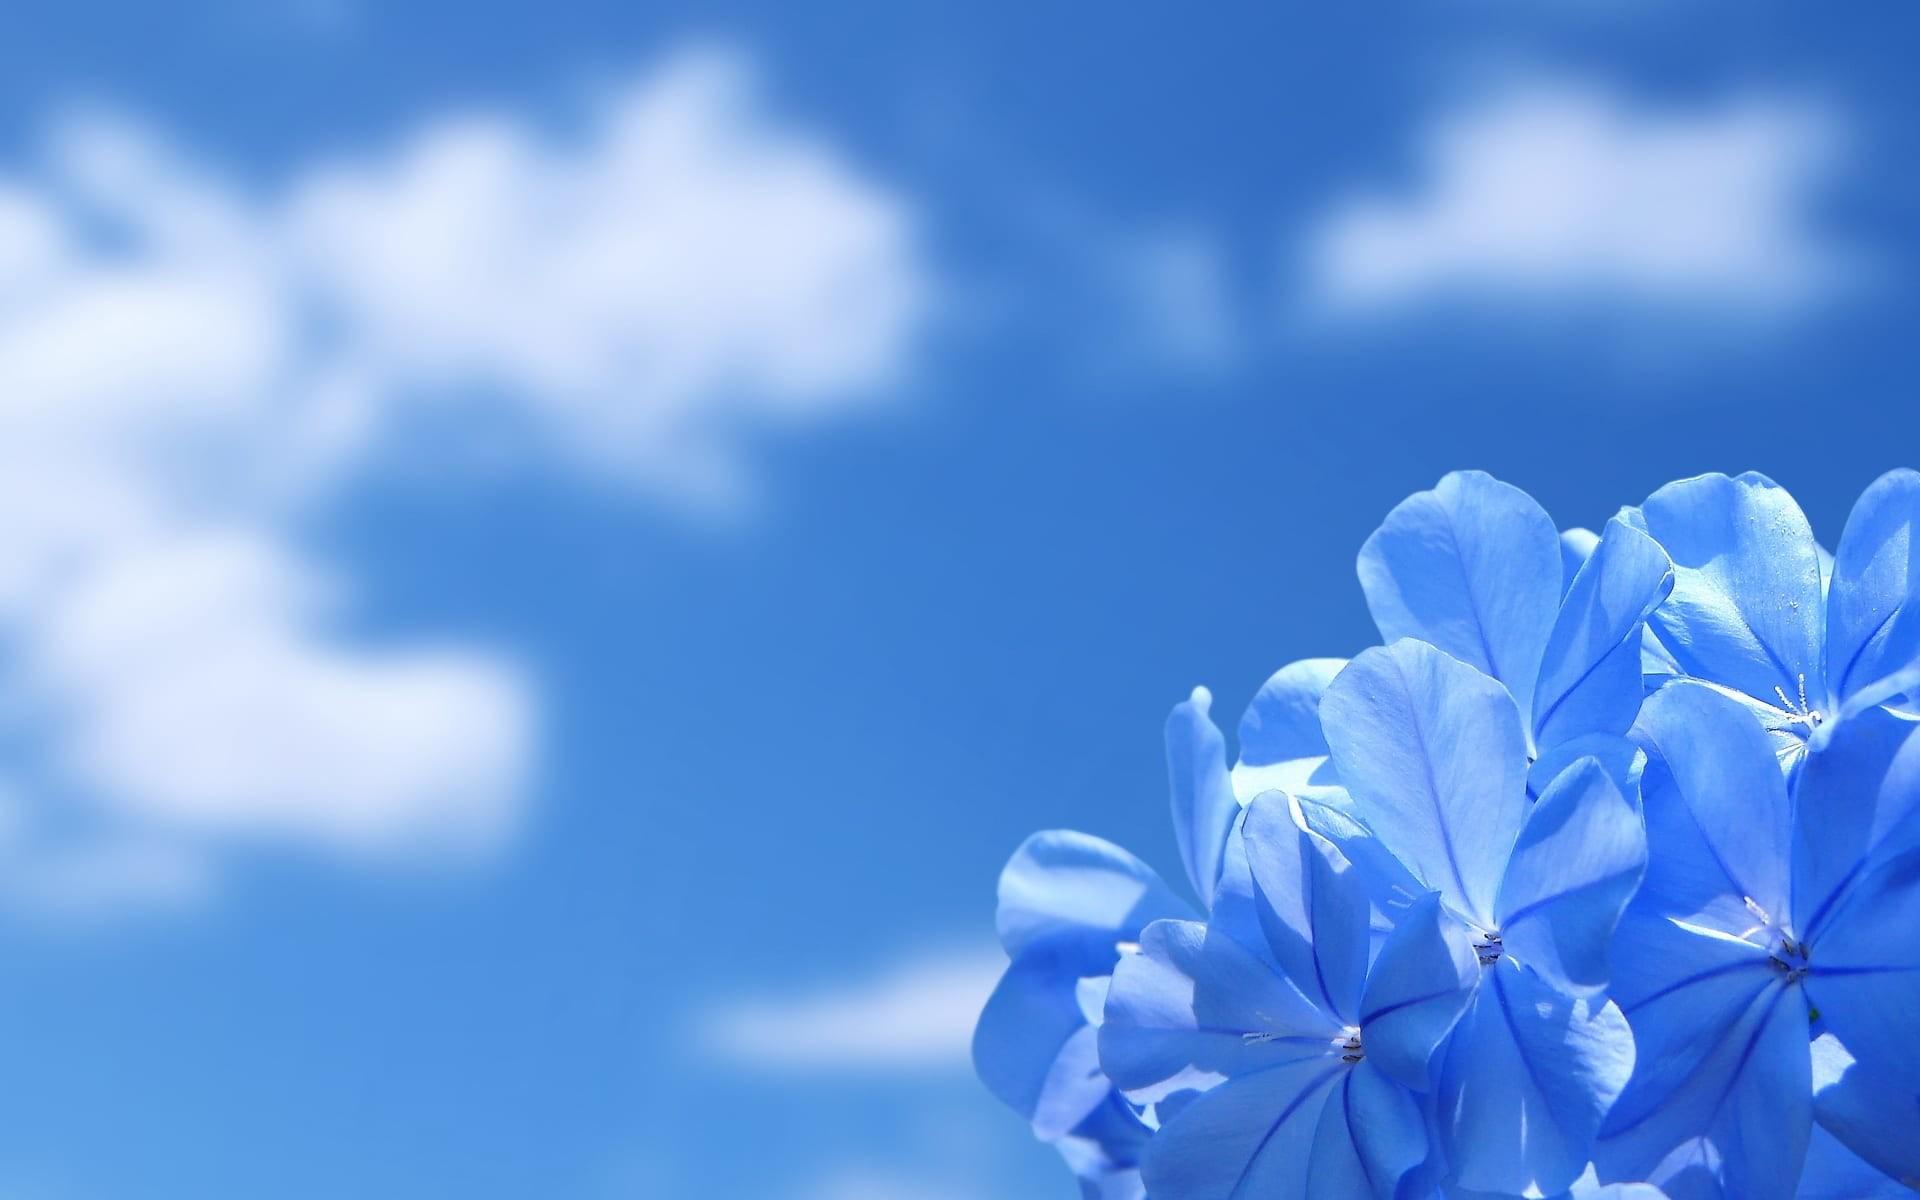 Blue Flower Desktop Backgrounds Wallpaper